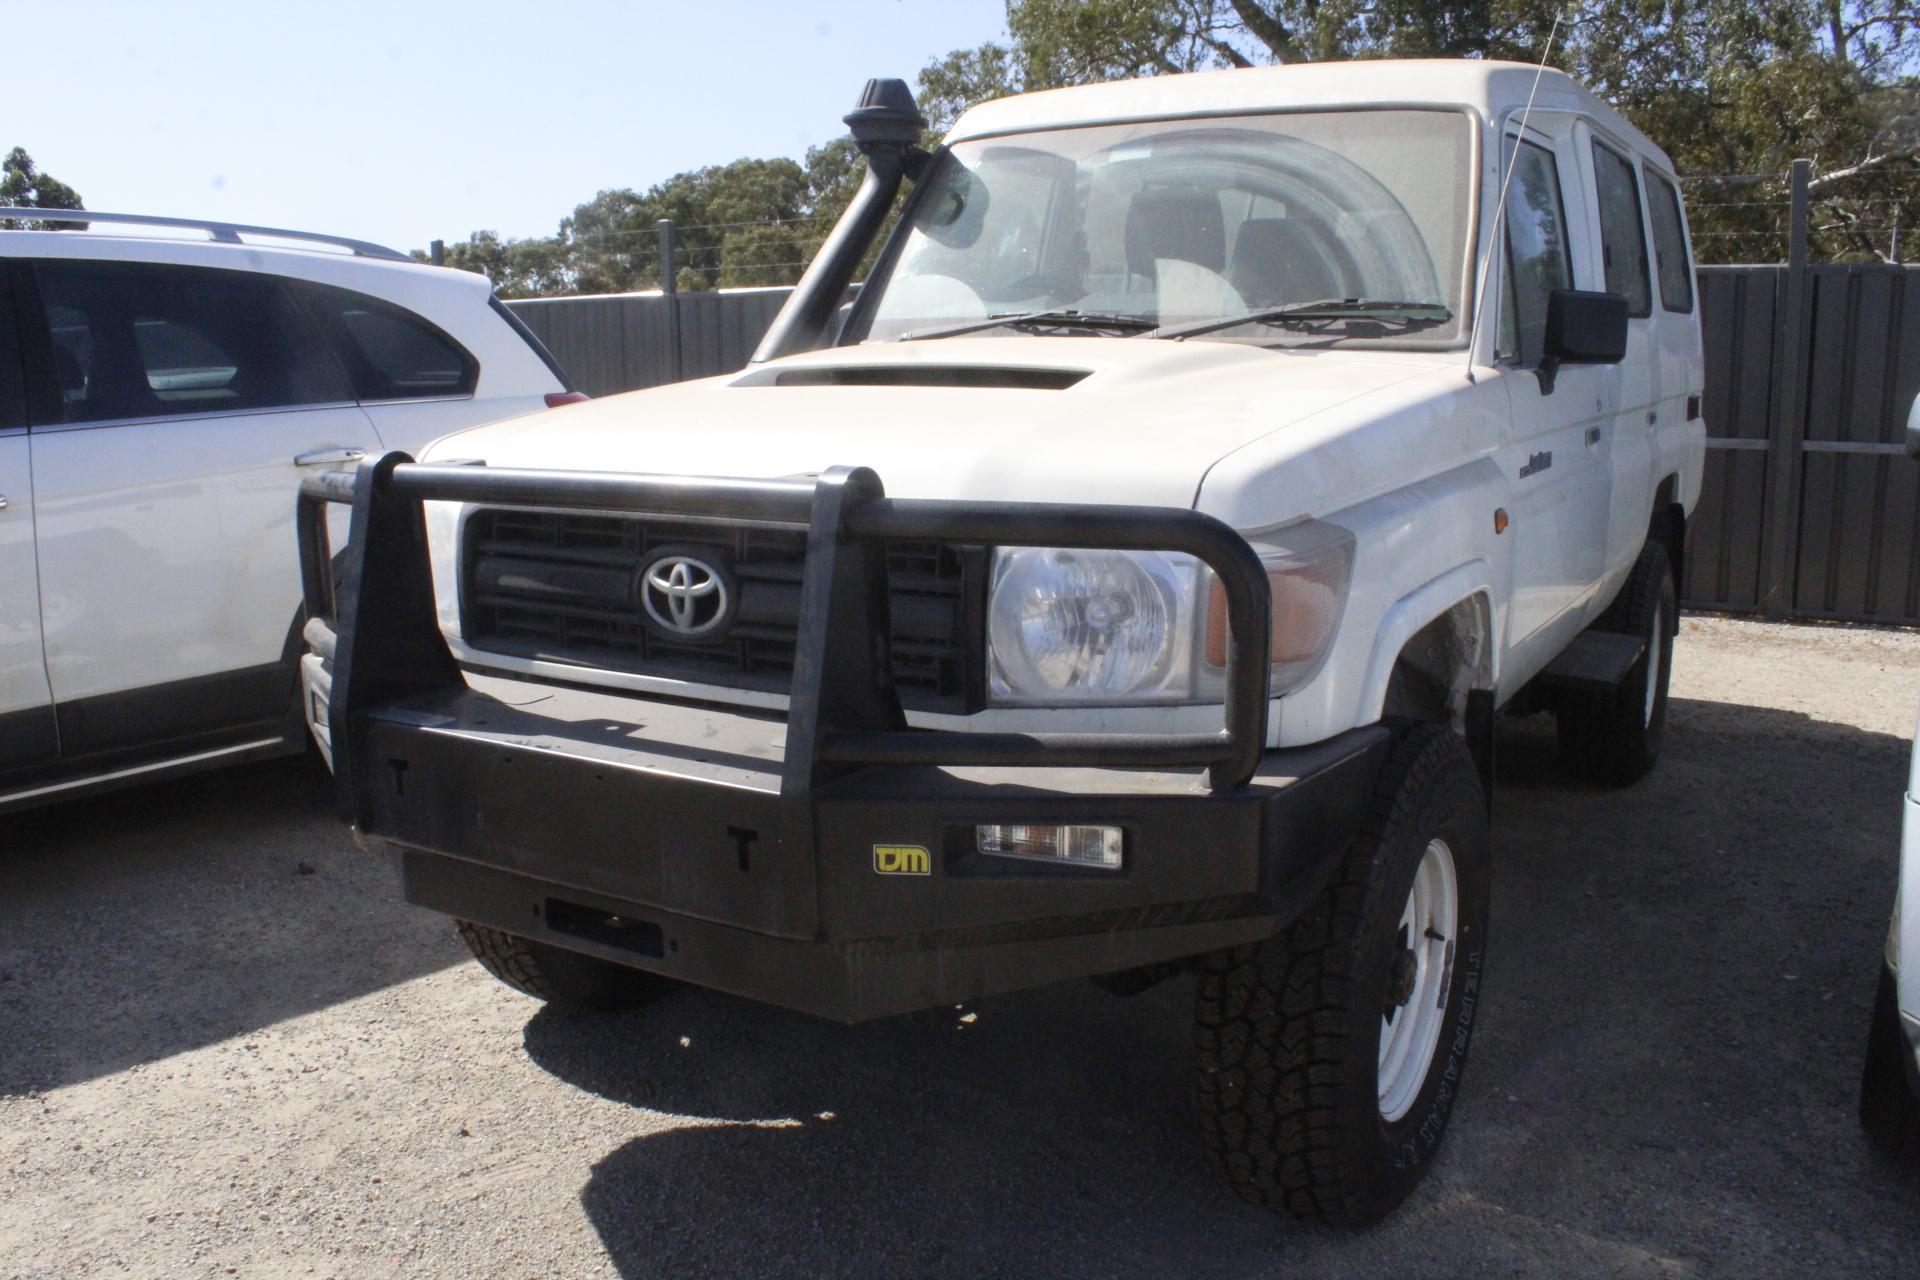 2013 Toyota Landcruiser Workmate (4x4) VDJ78R Turbo Diesel Manual Wagon